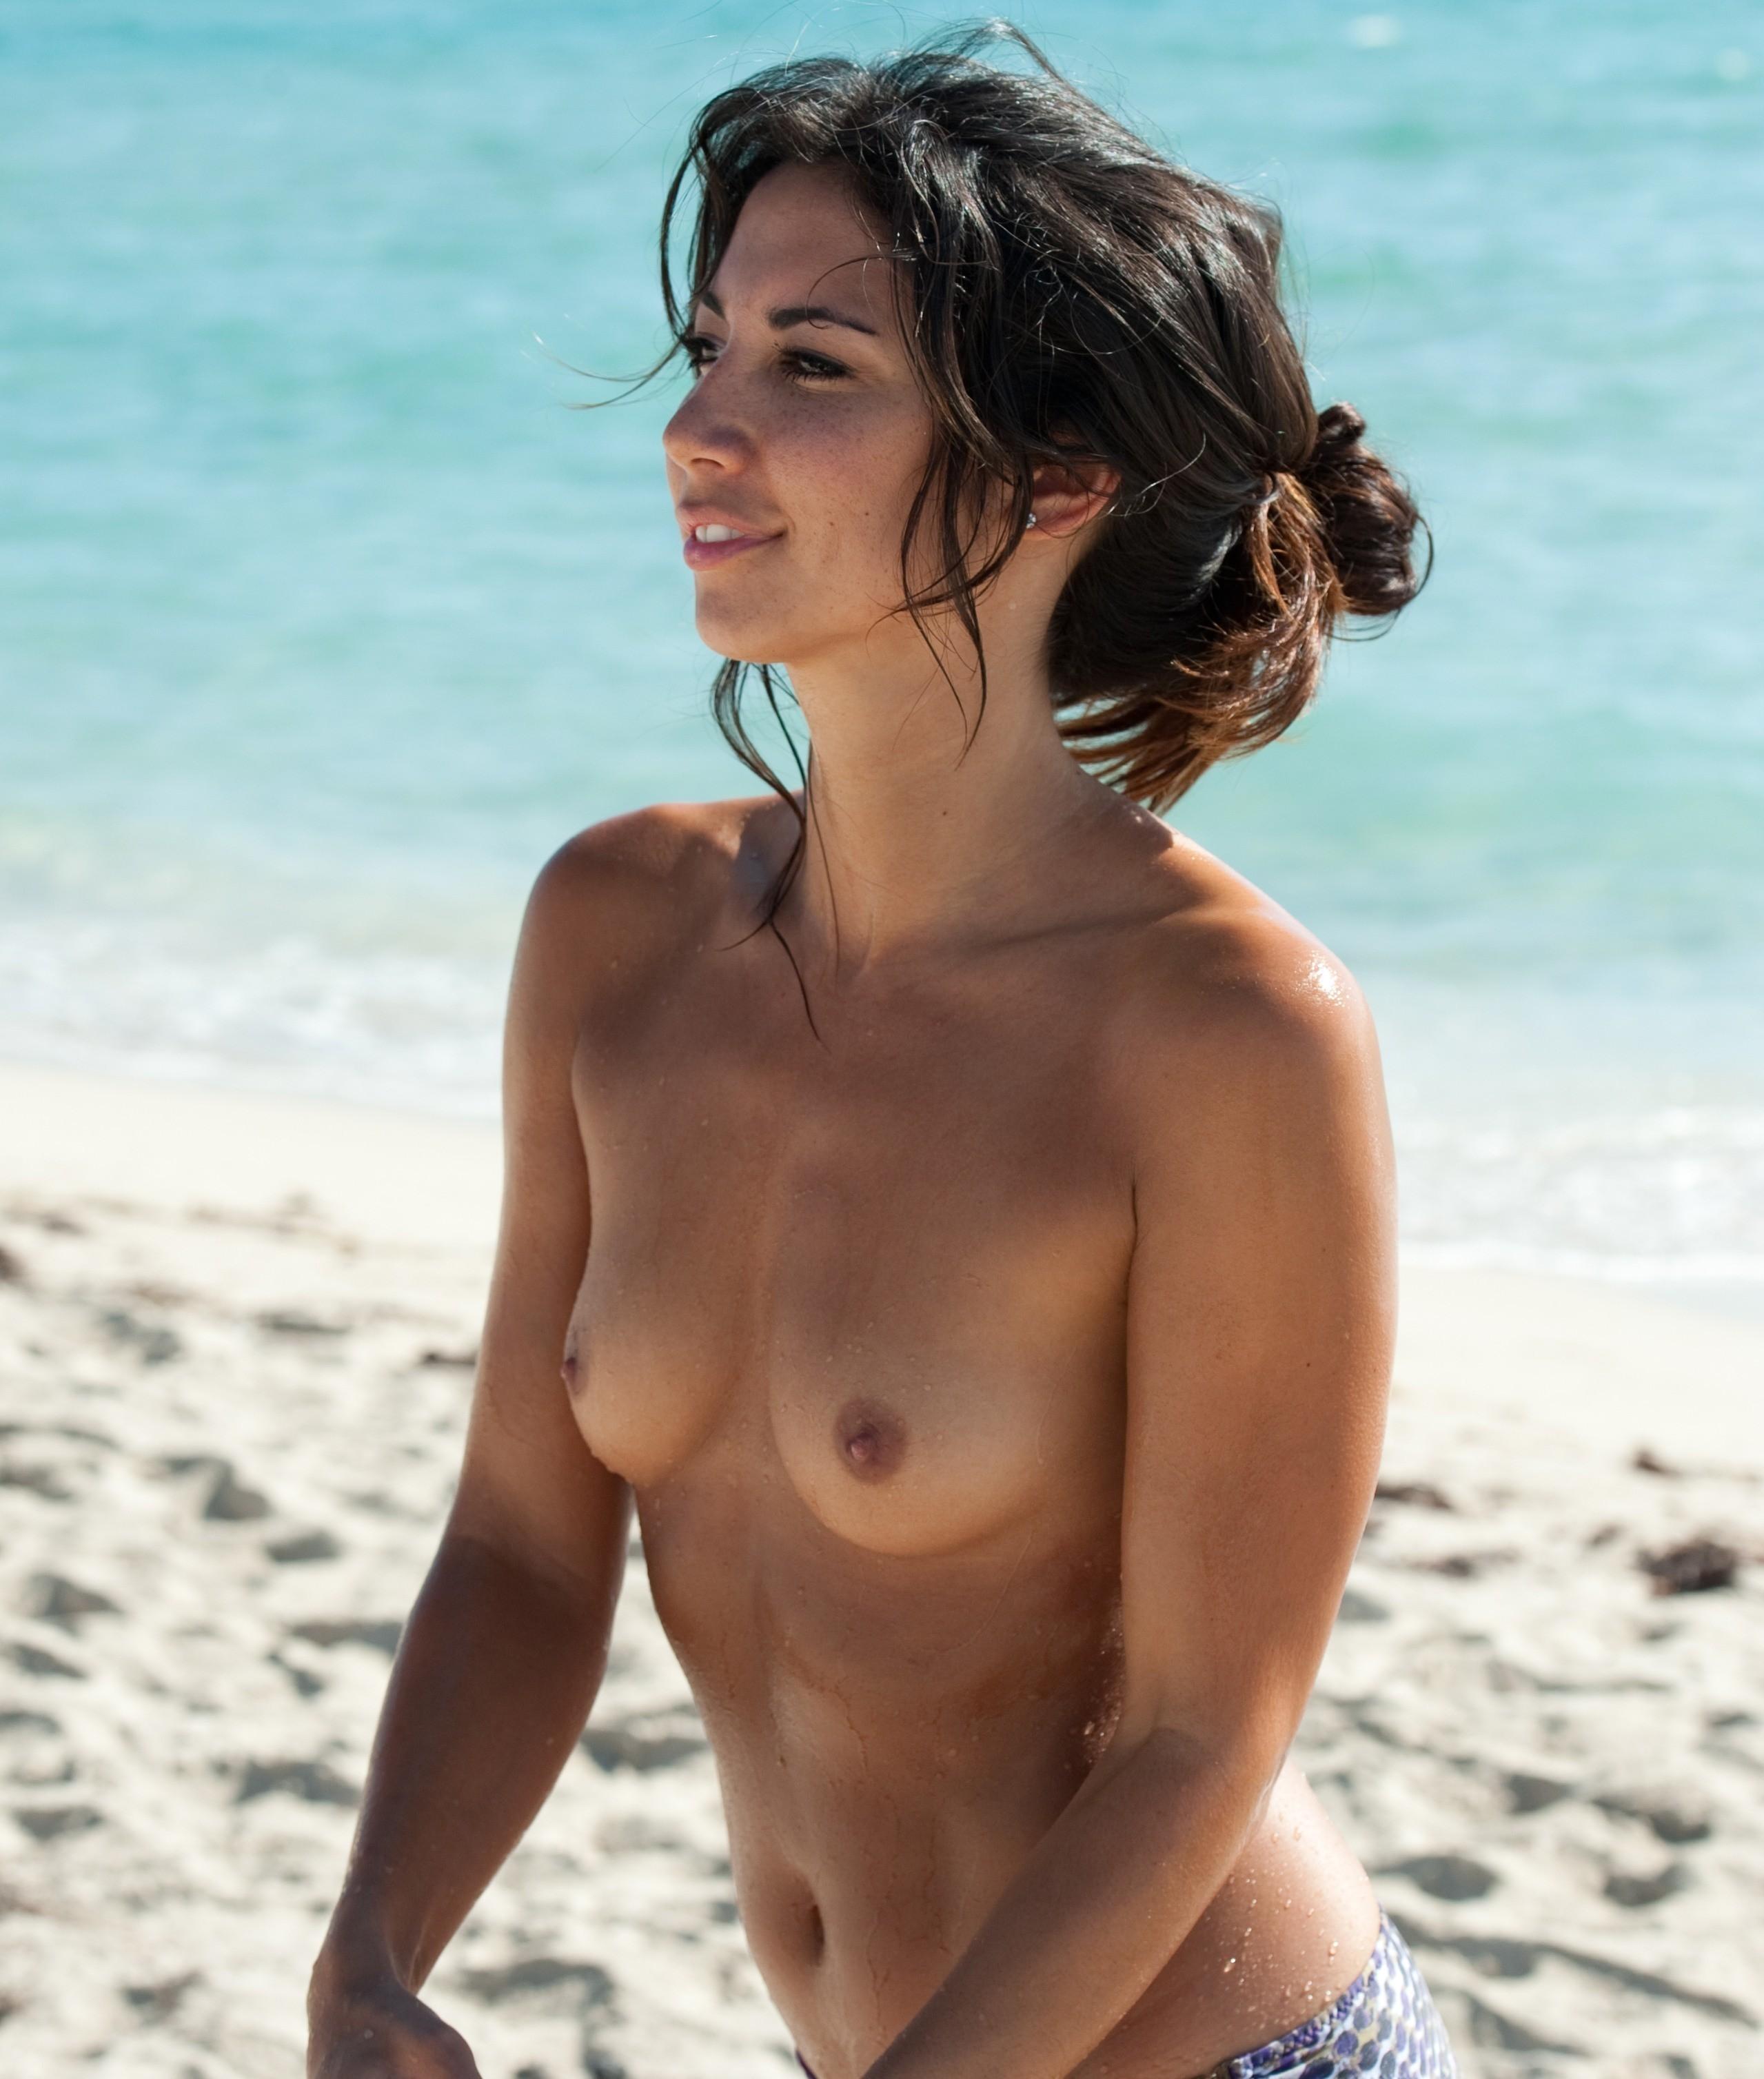 Topless Beach Model